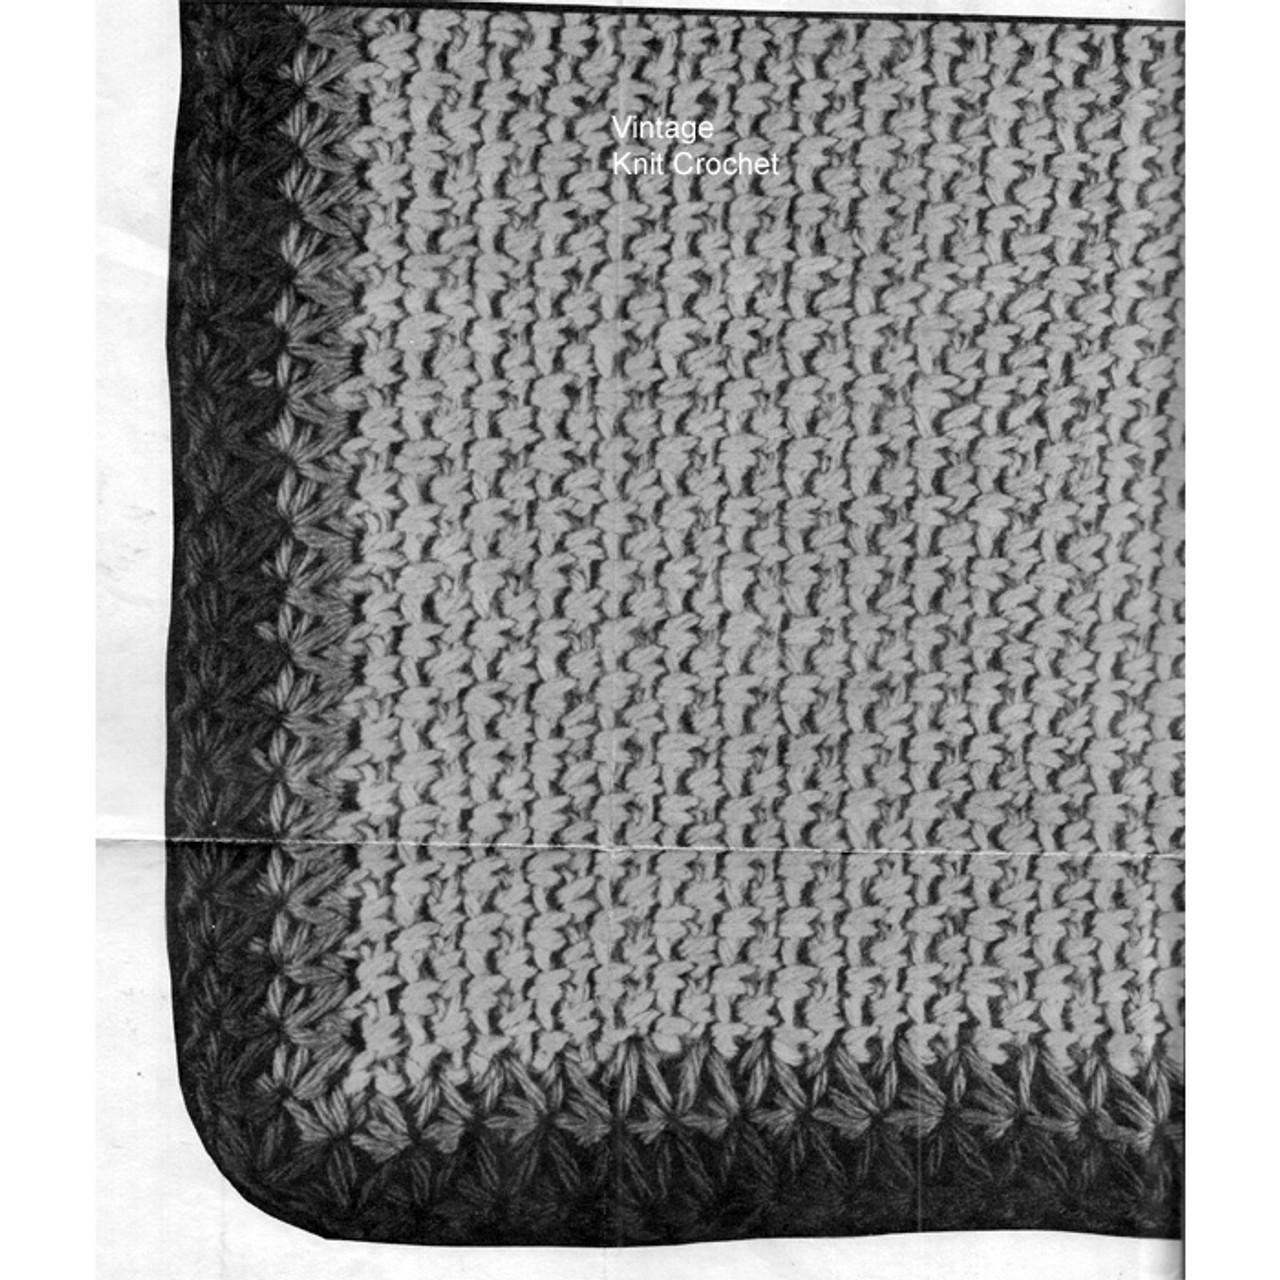 Star Stitch Border on Crochet Jacket